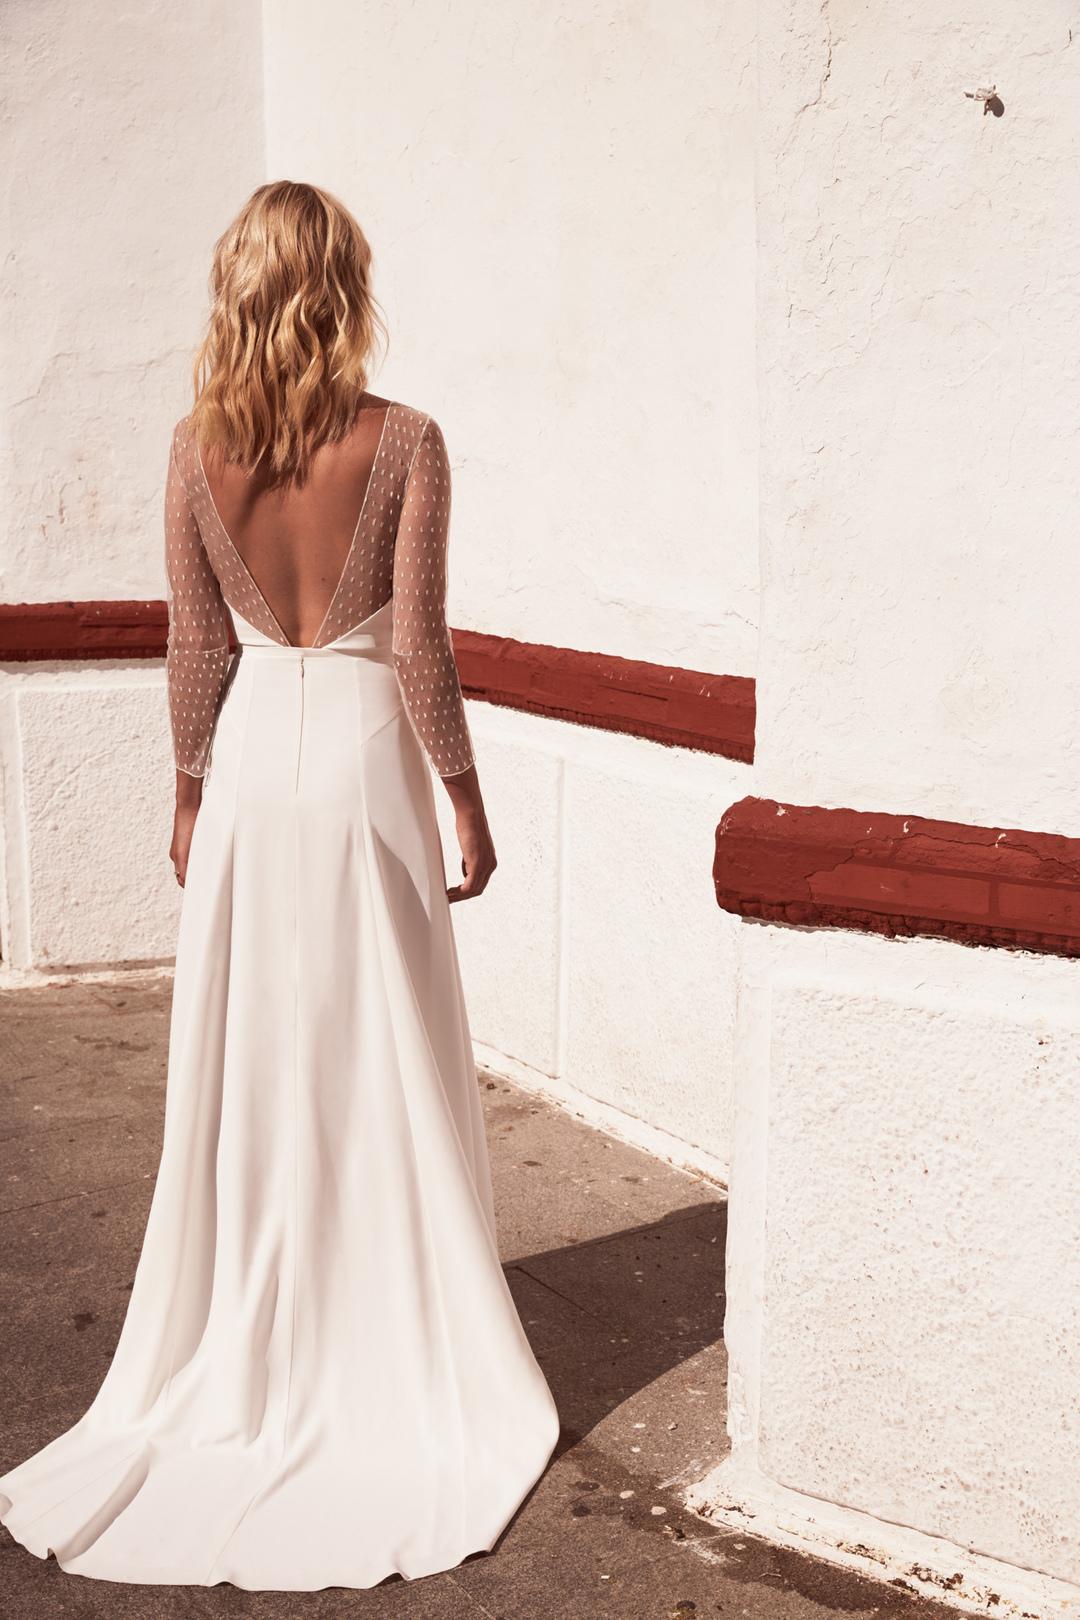 Dress main 2x 1546885680